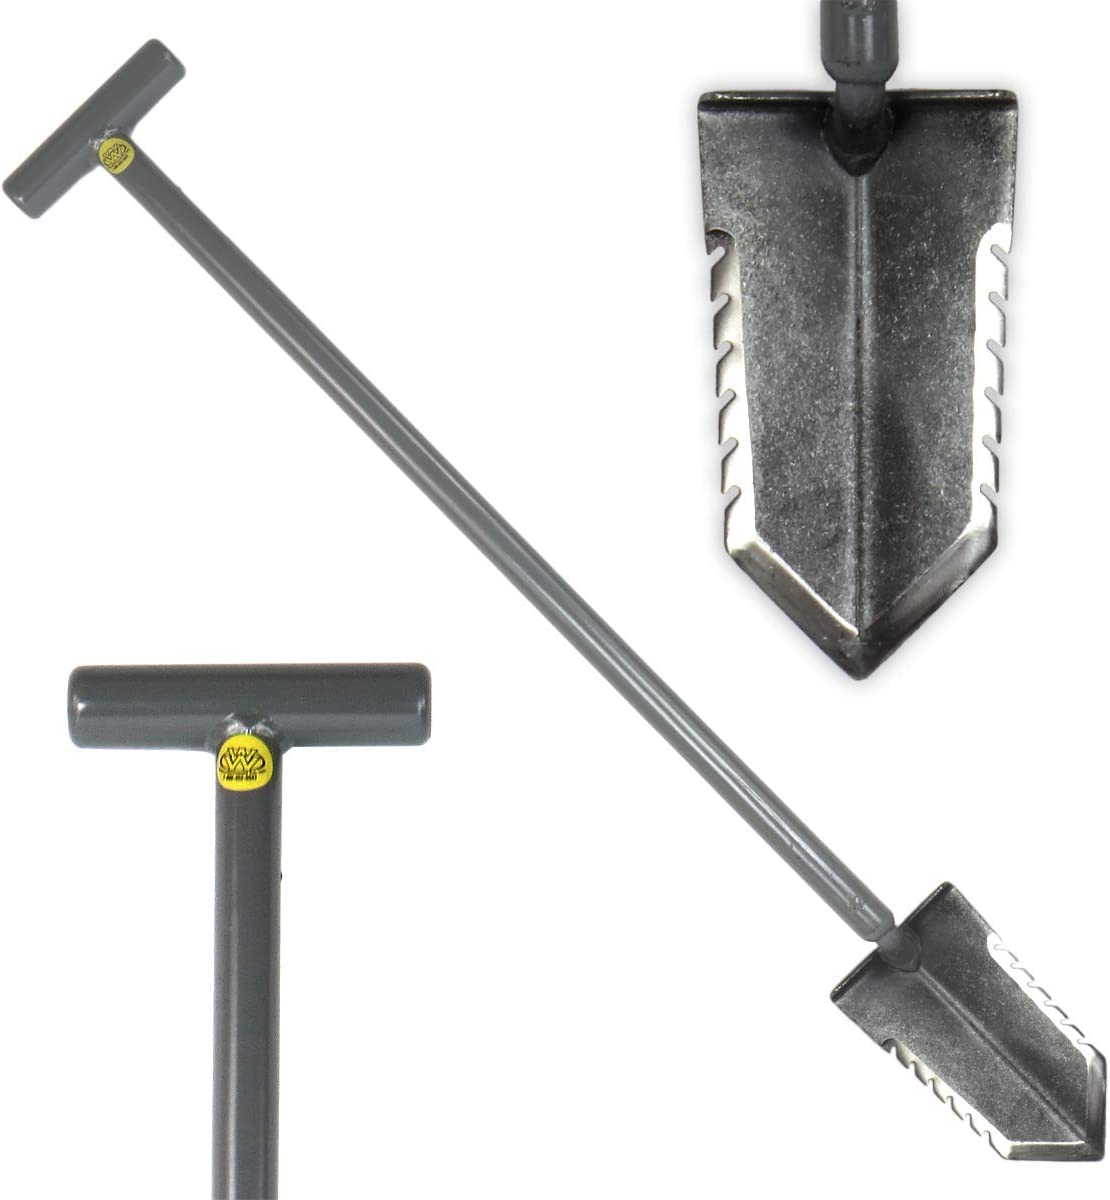 Handle 36 Heavy Duty Metal Detector Shovel Double Serrated Blade Lesche T